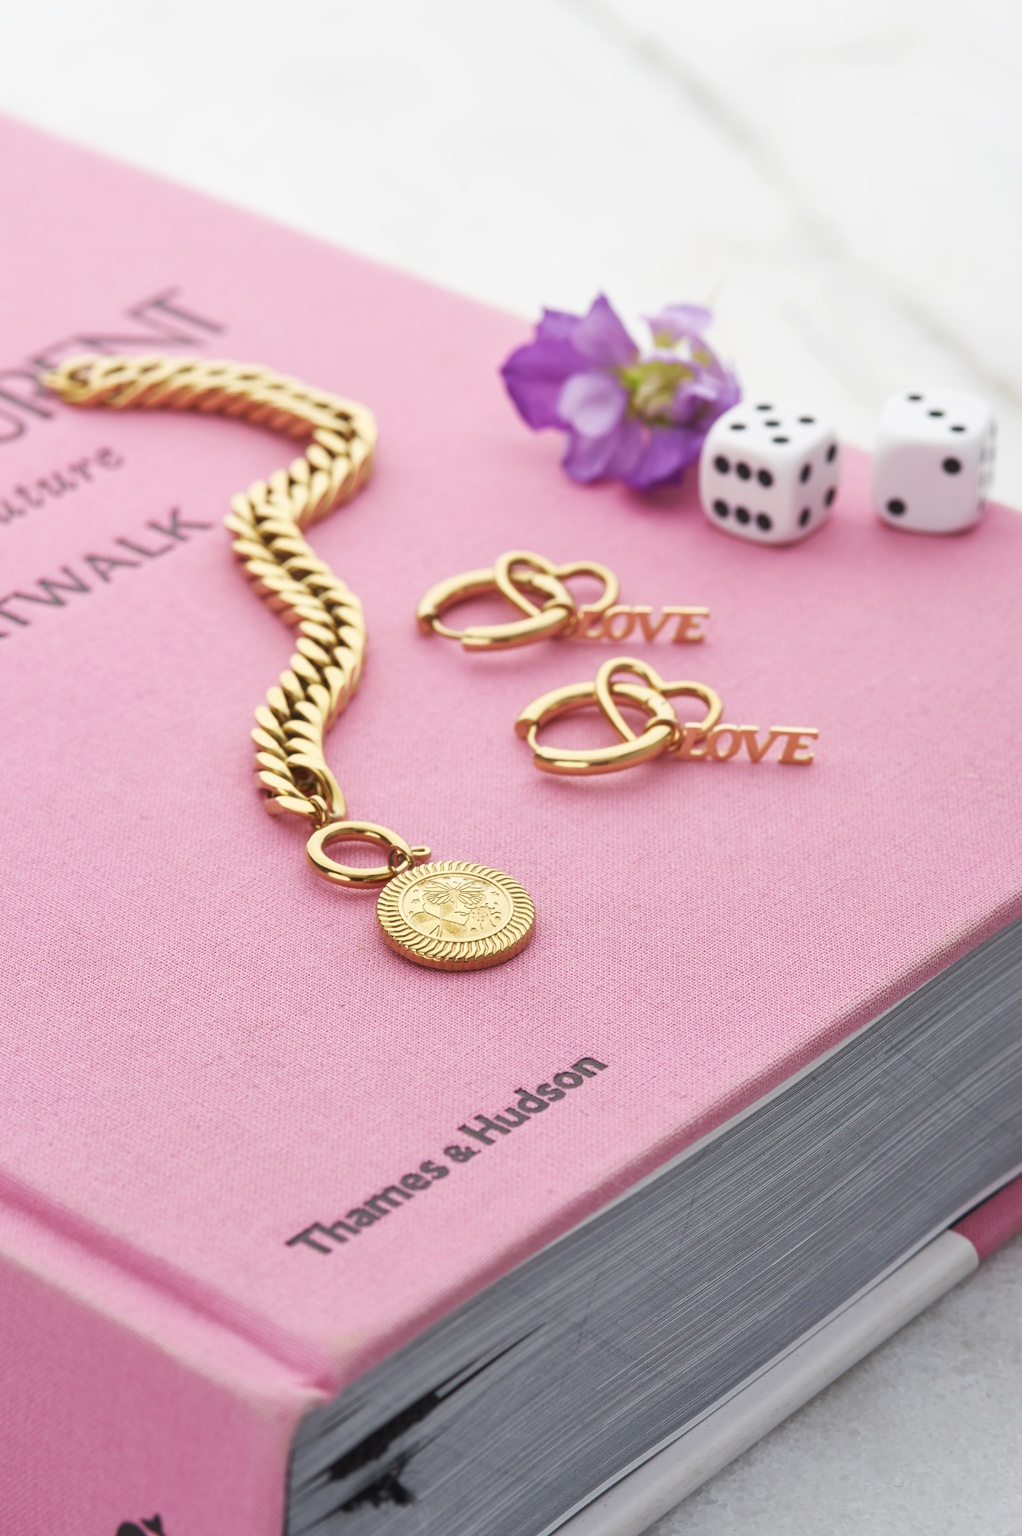 My Jewellery - my-10